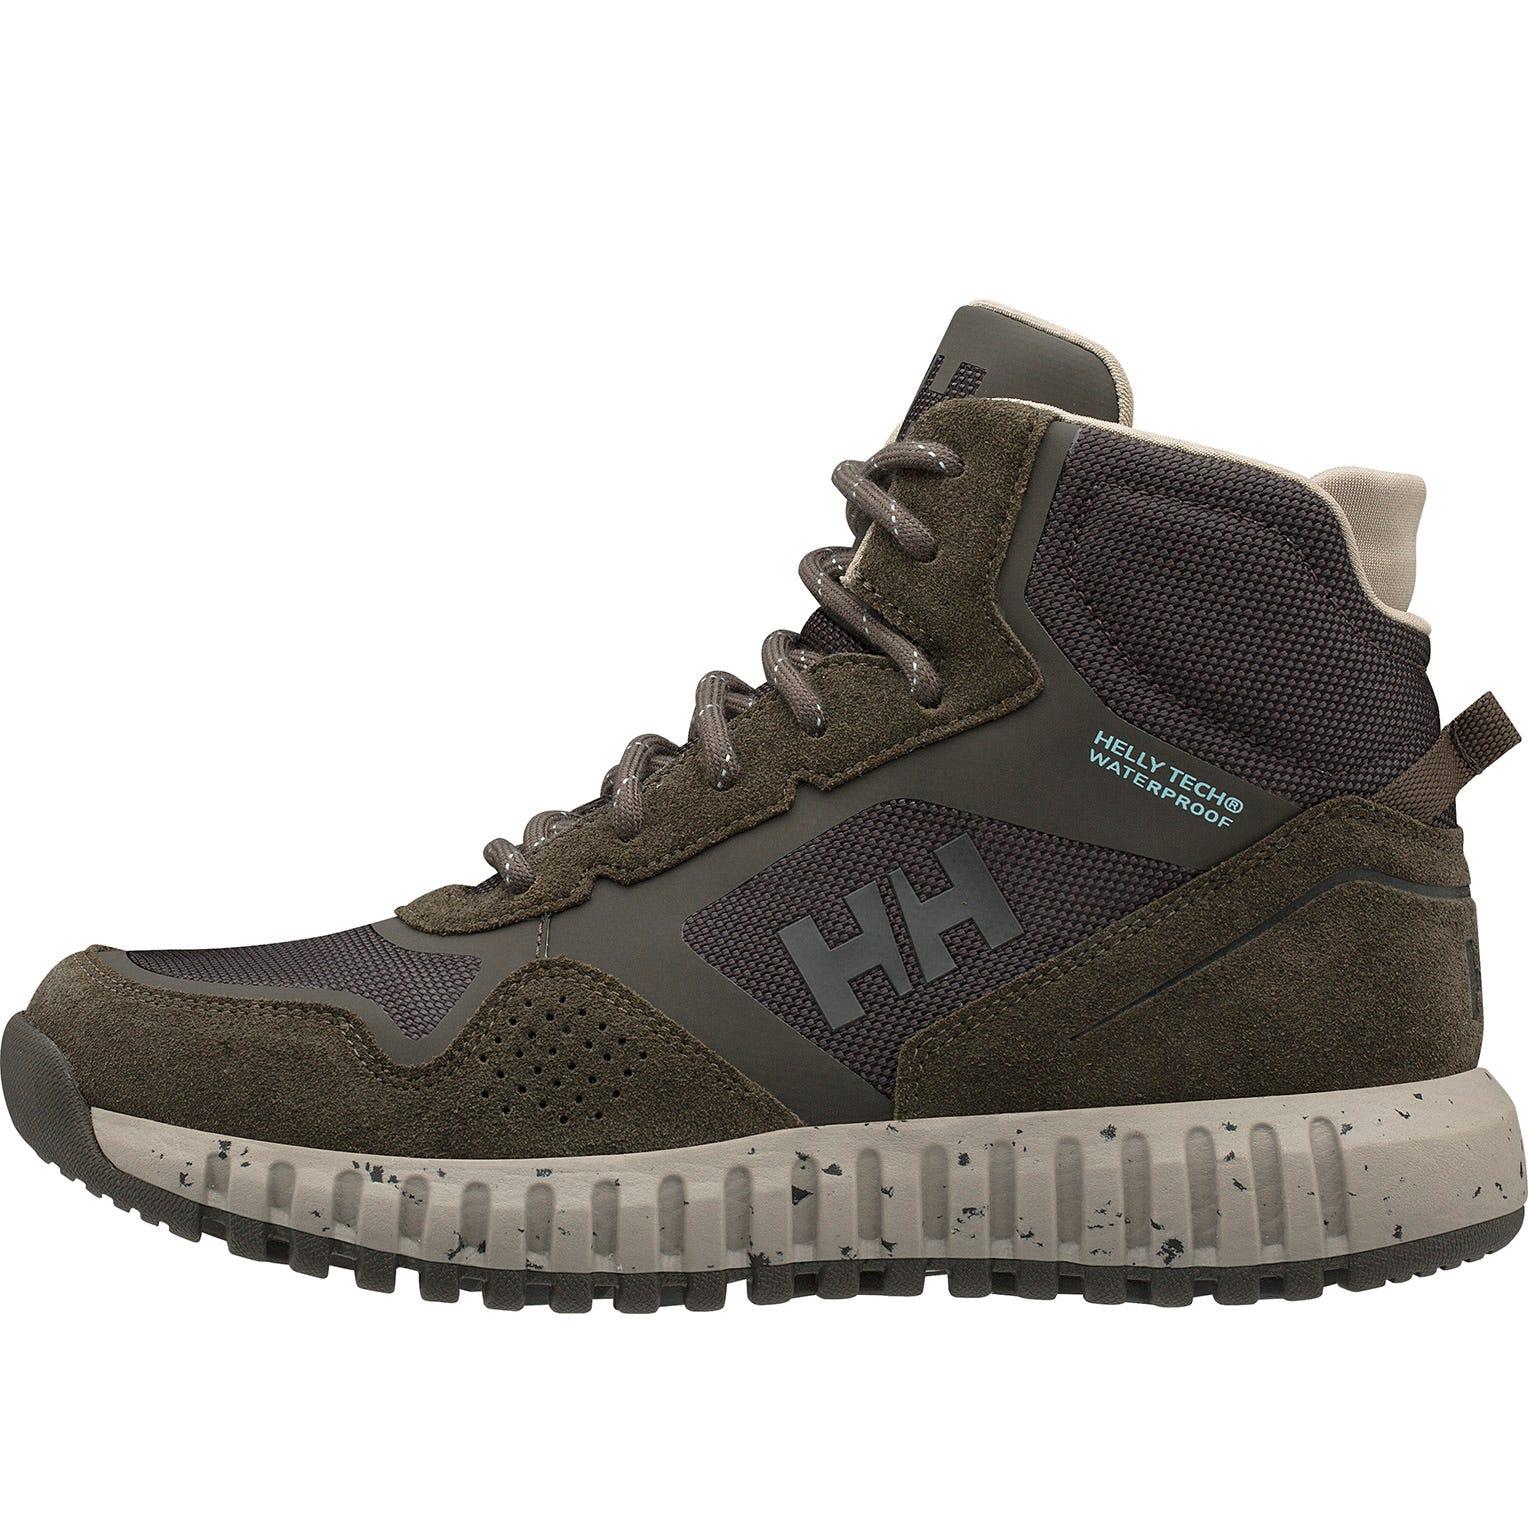 Helly Hansen W Monashee Ullr Ht Womens Hiking Boot Brown 40/8.5